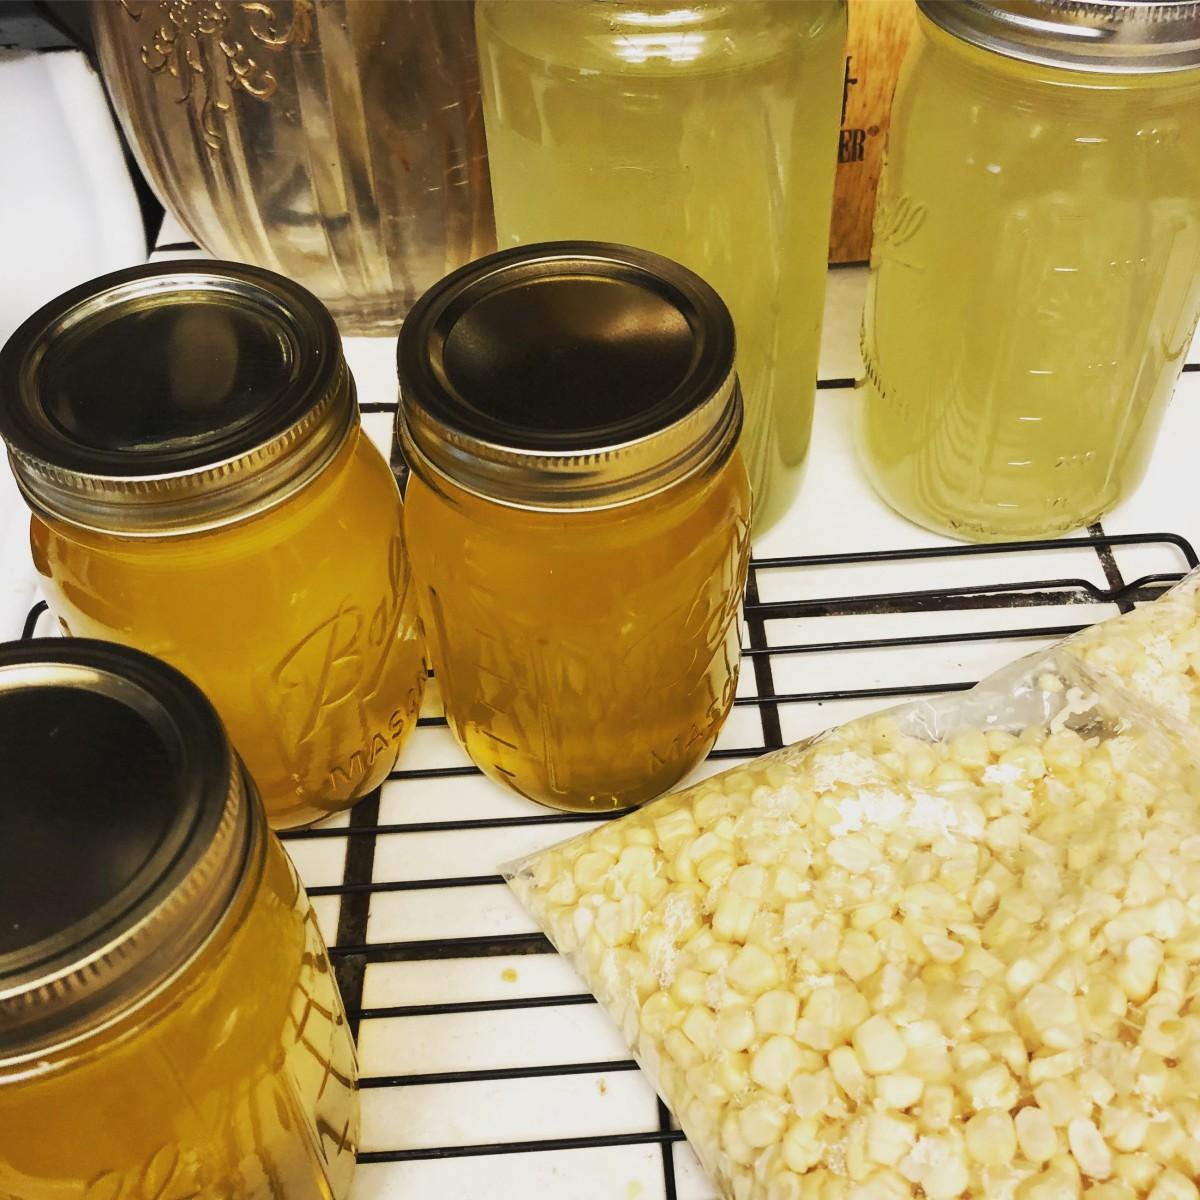 Corn cob jelly tastes like summer in a jar